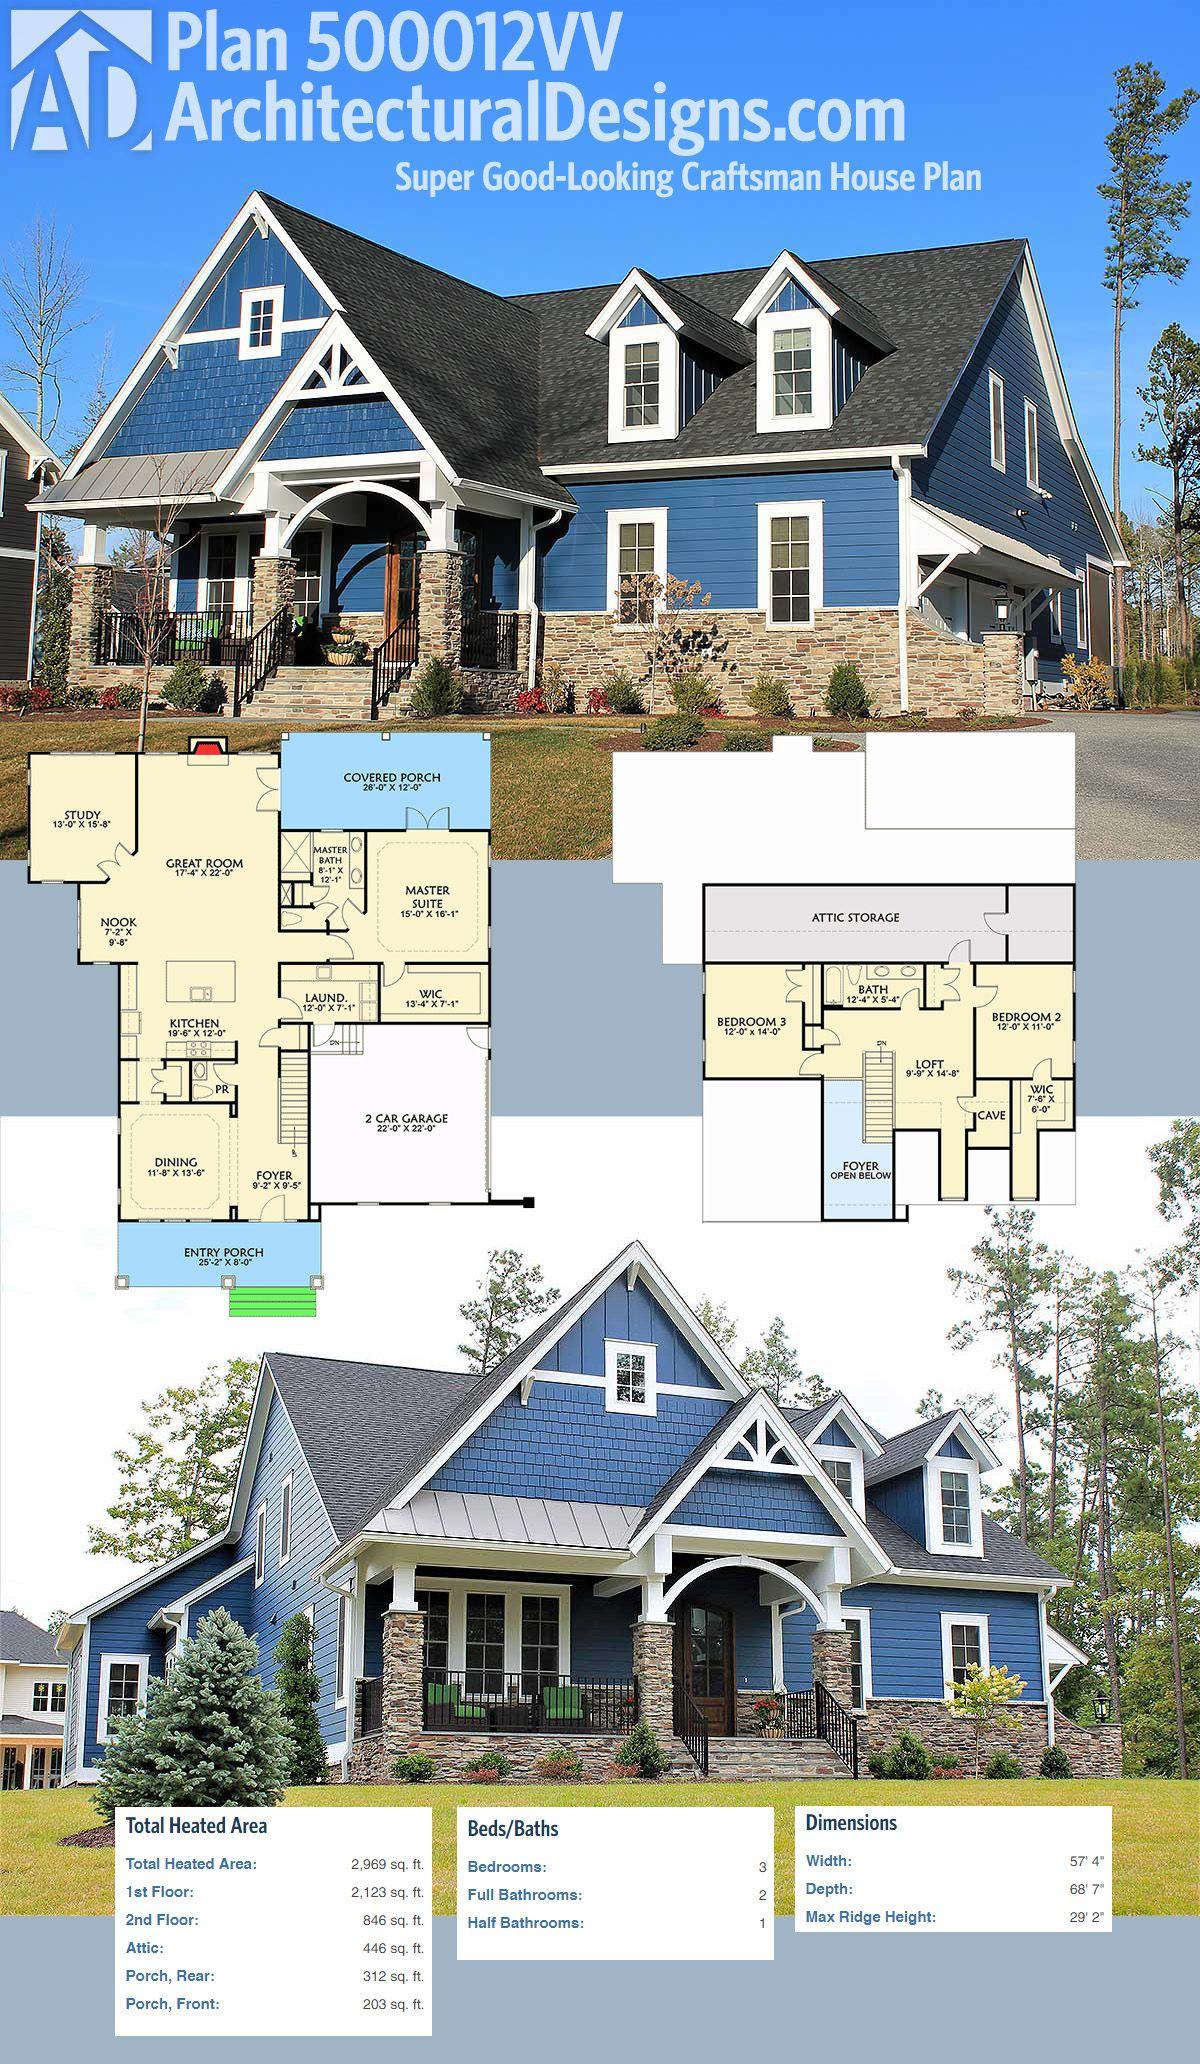 Plan 500012VV Super GoodLooking Craftsman House Plan House